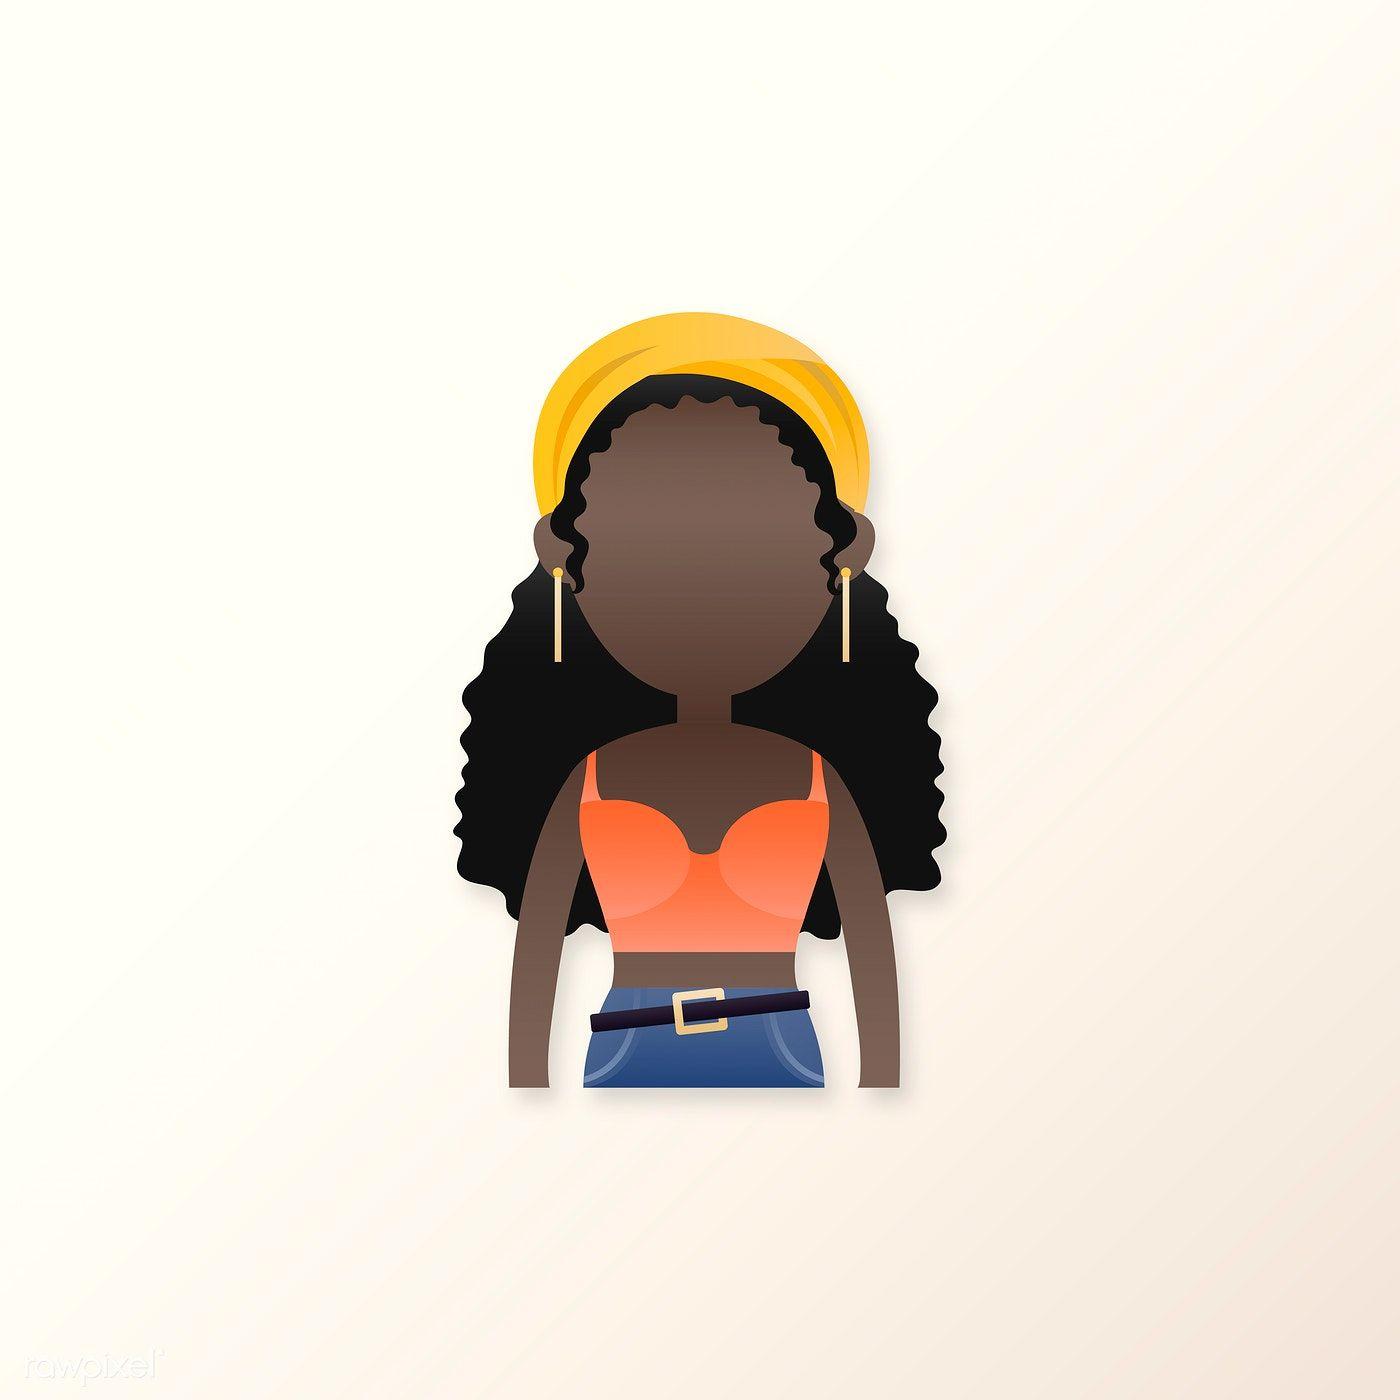 Download Premium-Vektor von Young Black Girl Avatar Vektor 2024264